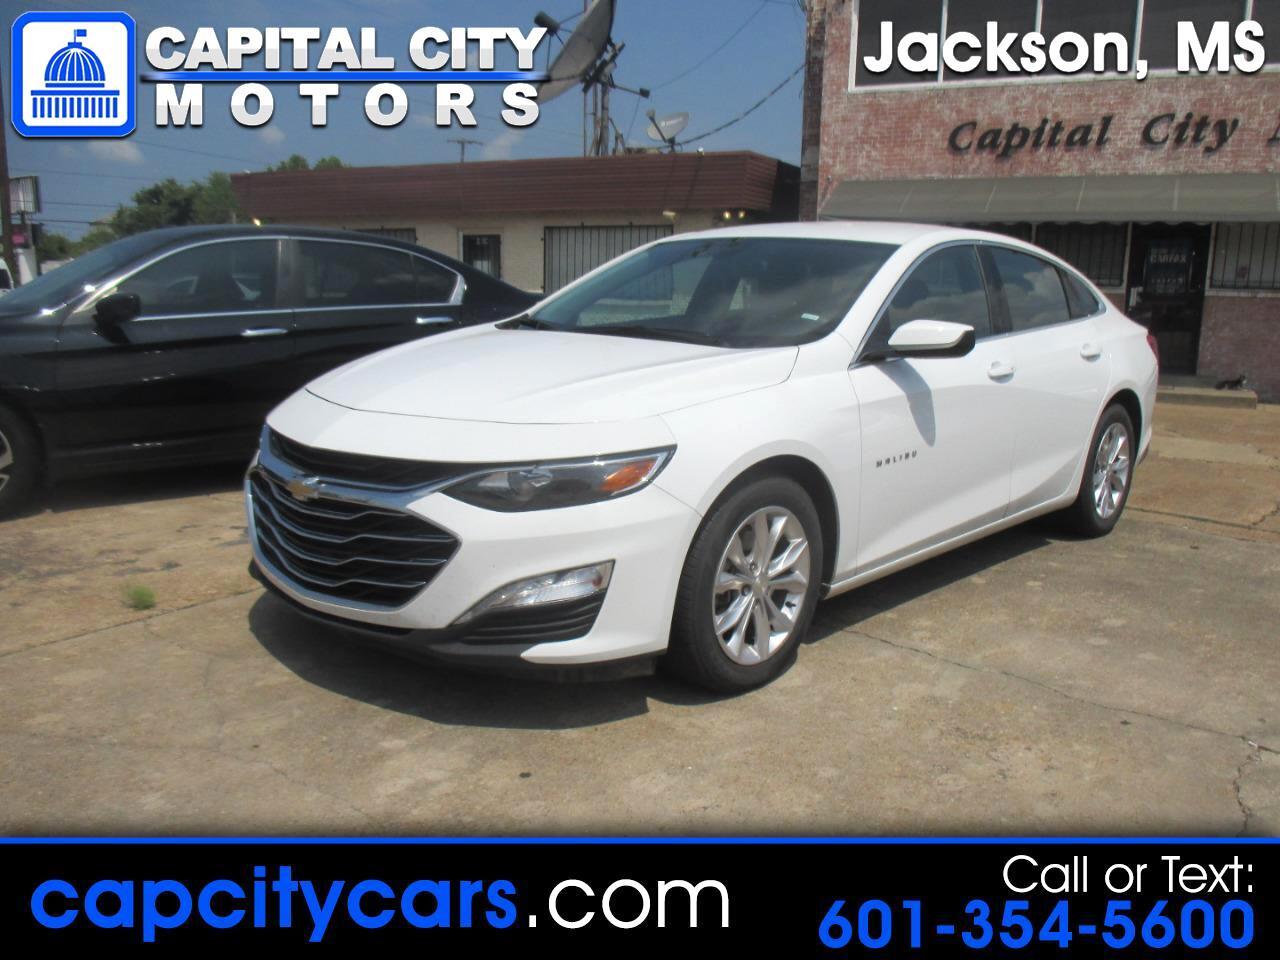 Car Lots In Jackson Ms >> Used Cars For Sale Jackson Ms 39201 Capital City Motors Jackson